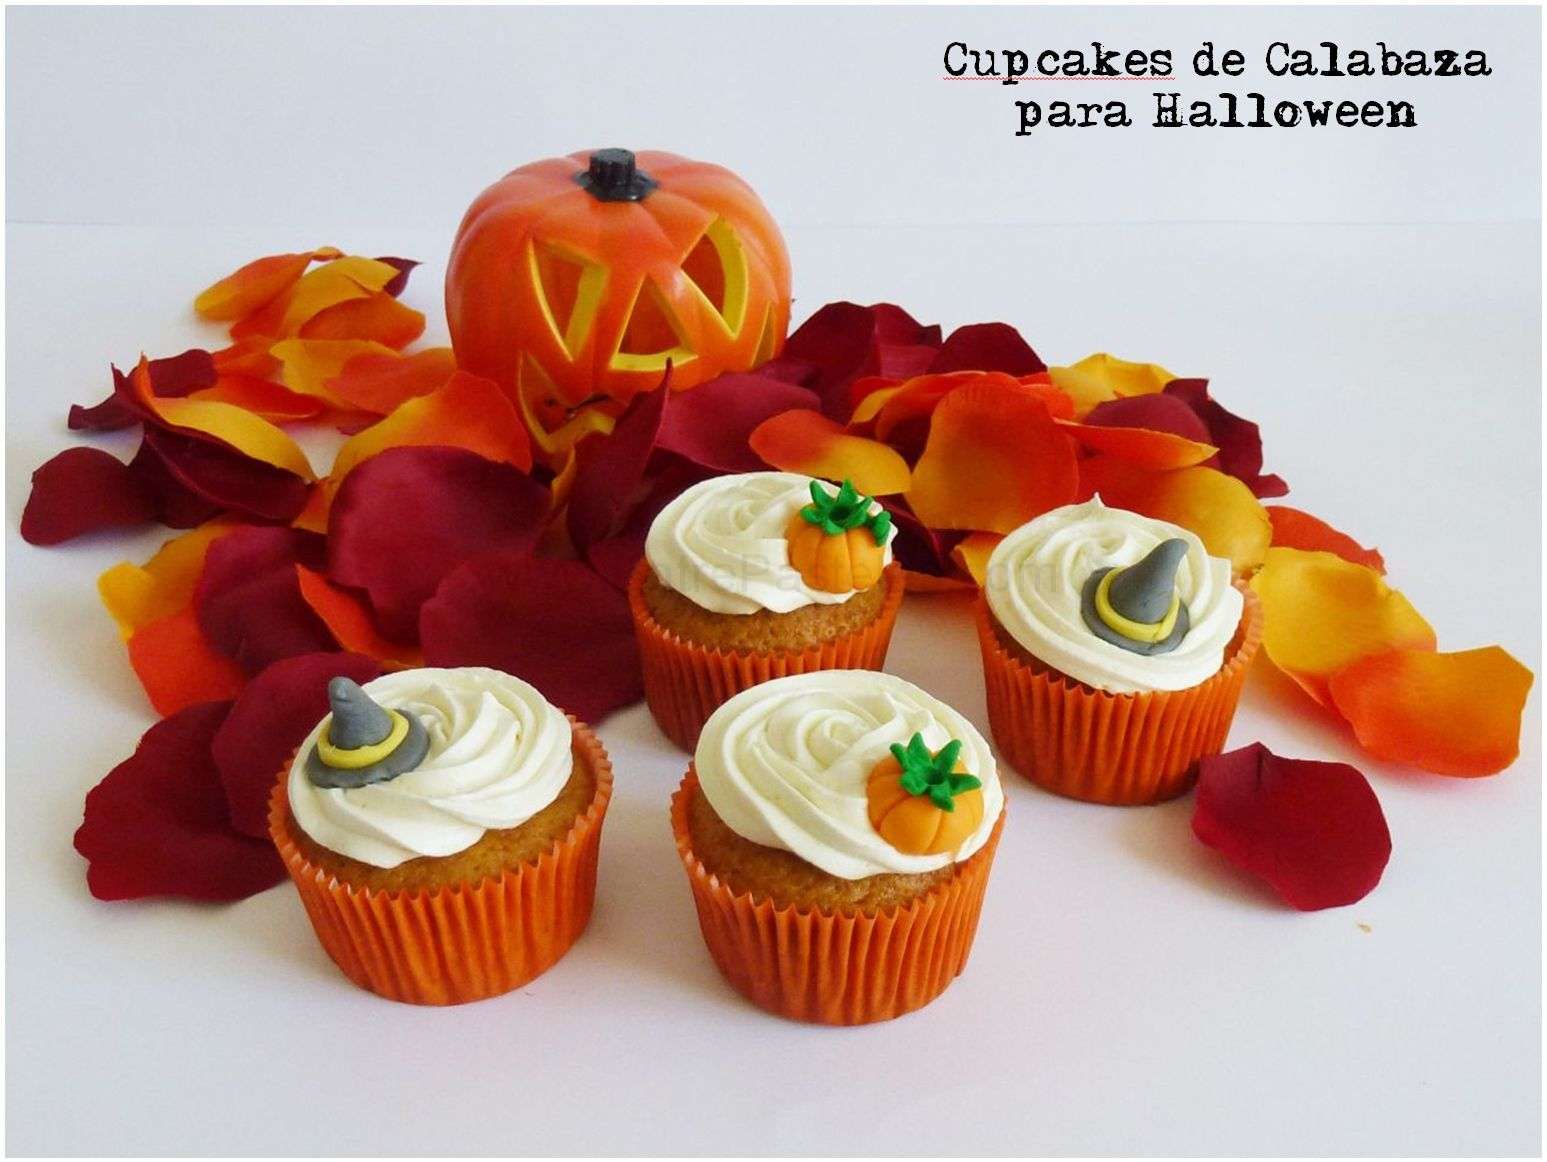 2013-10-18-12h28m53s-cupcakescalabaza1